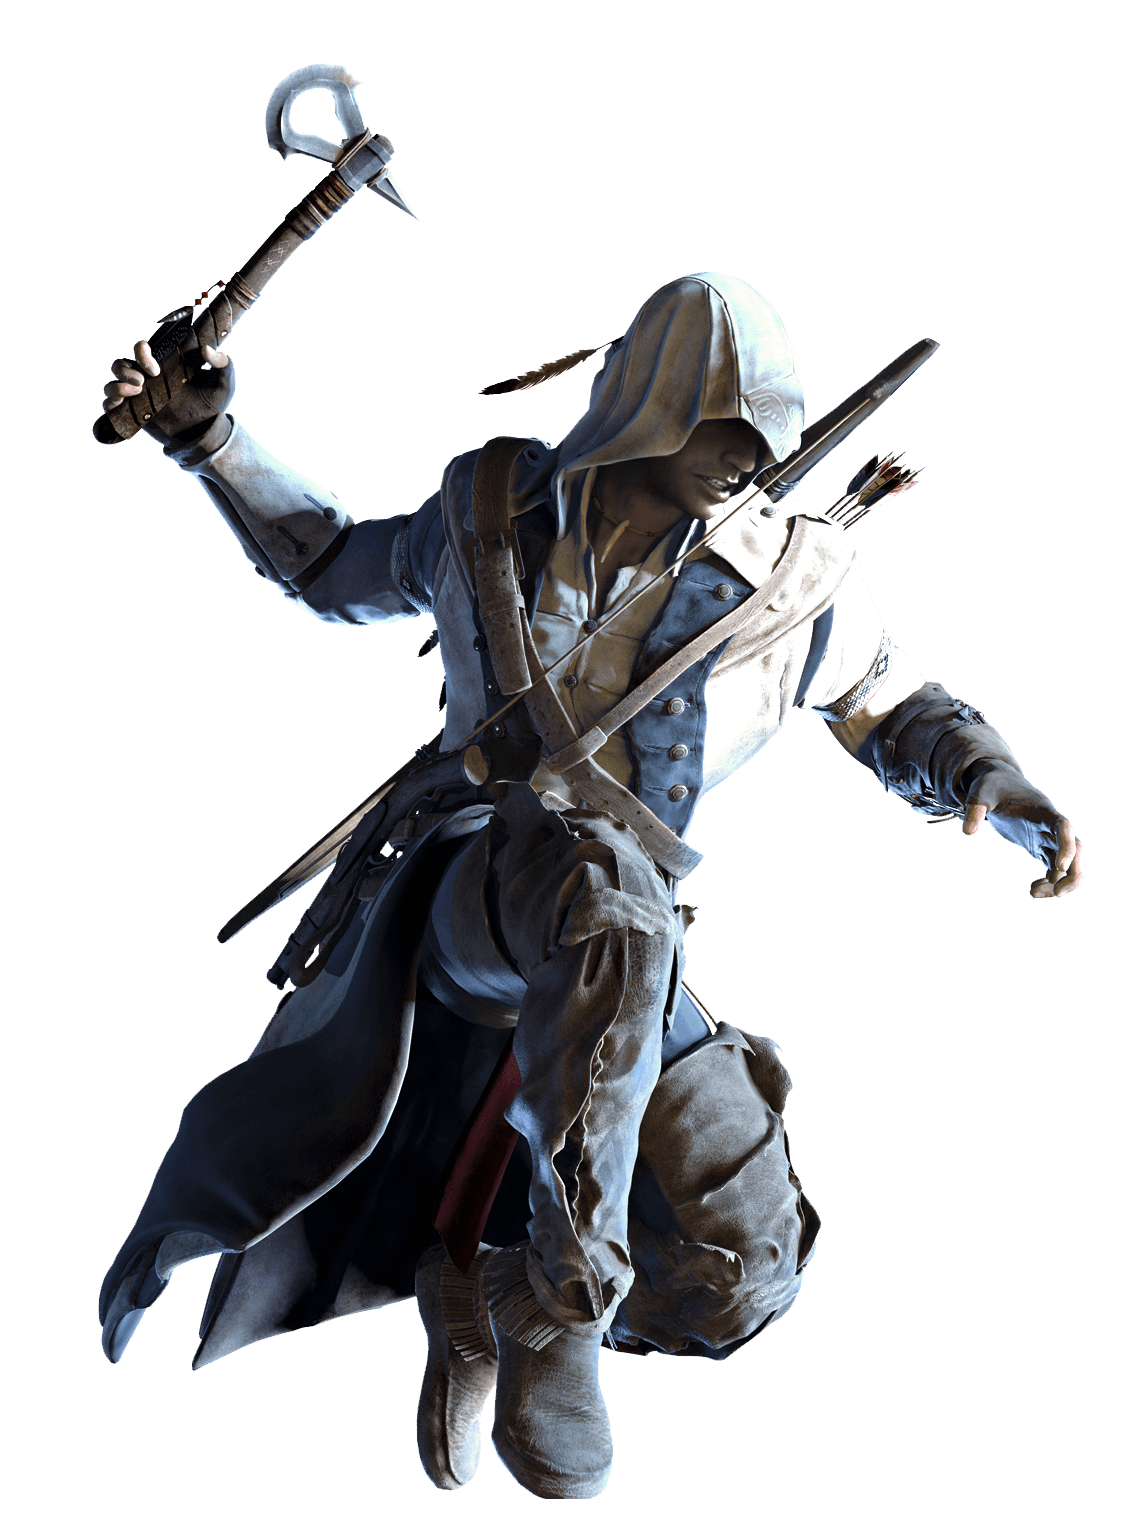 Assassins Creed Jump - Assassins Creed, Transparent background PNG HD thumbnail